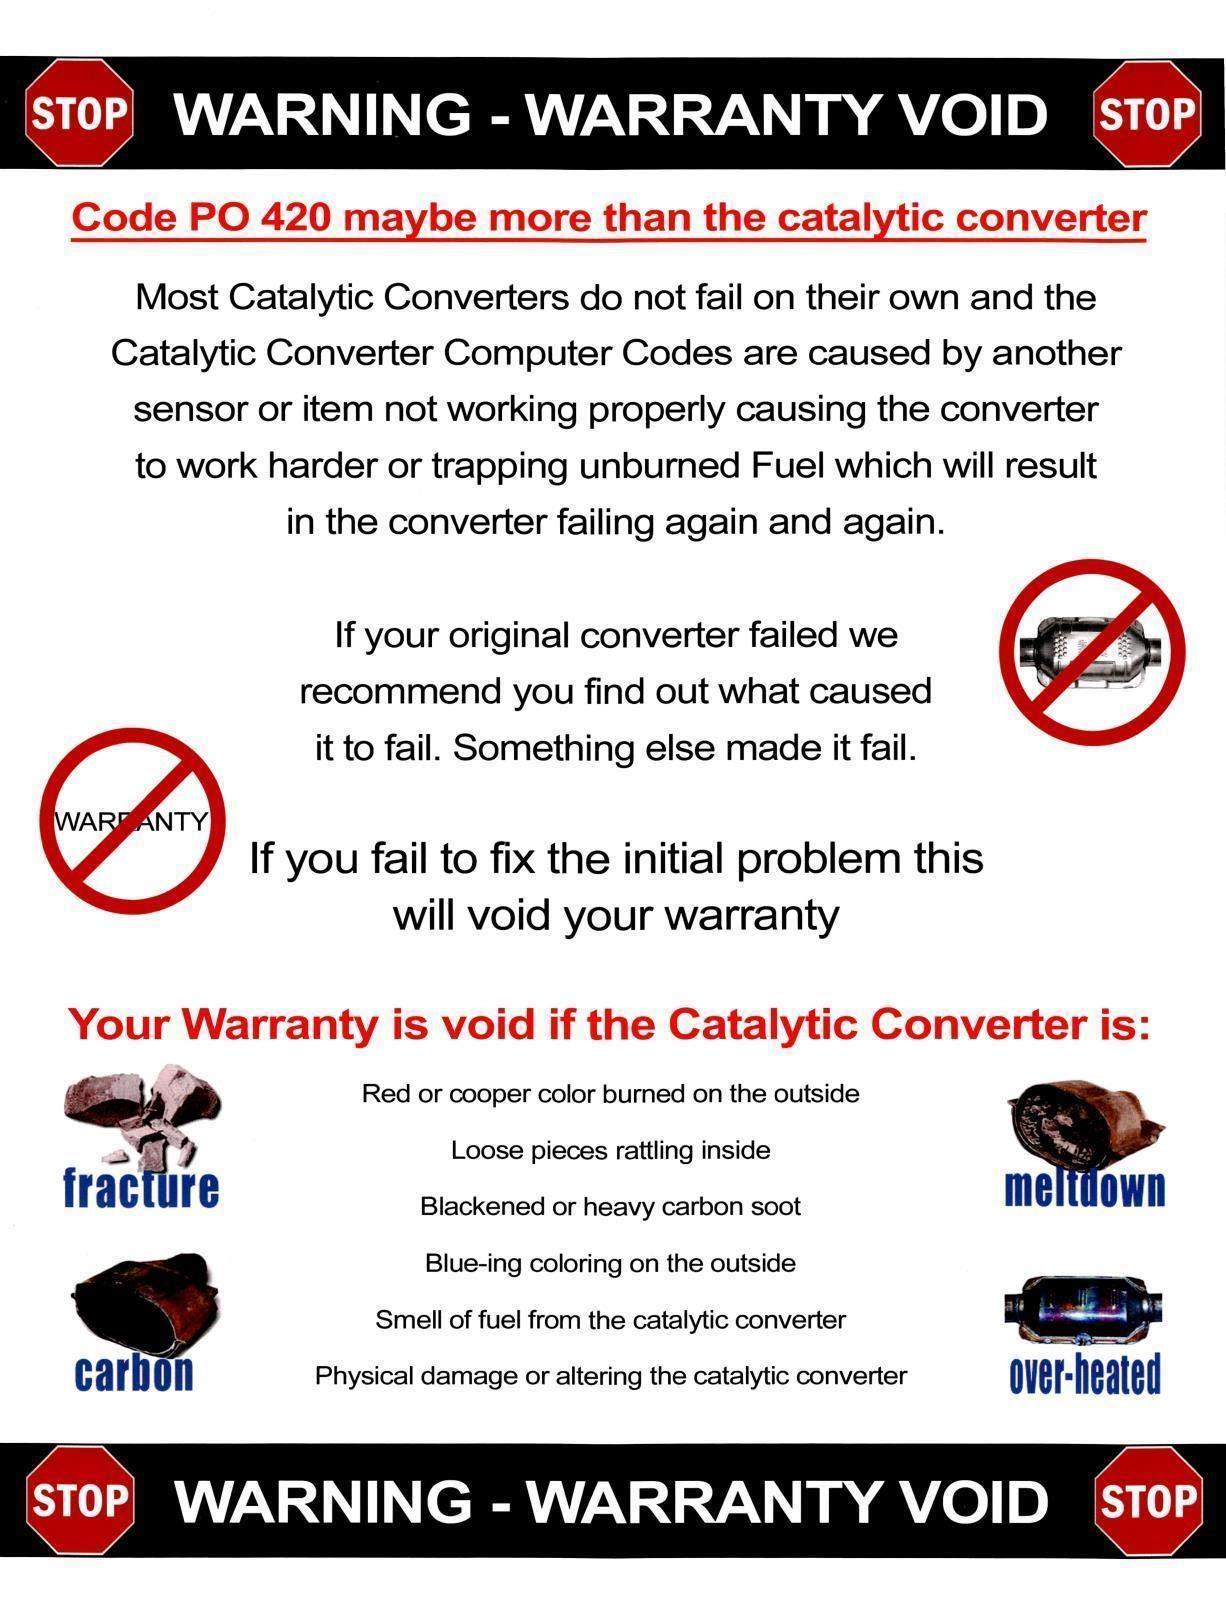 Mac Auto Parts 139401 QX56 Armada Titan 5.6L Driver Side Manifold Catalytic Converter & O2 Sensor by Mac Auto Parts (Image #1)